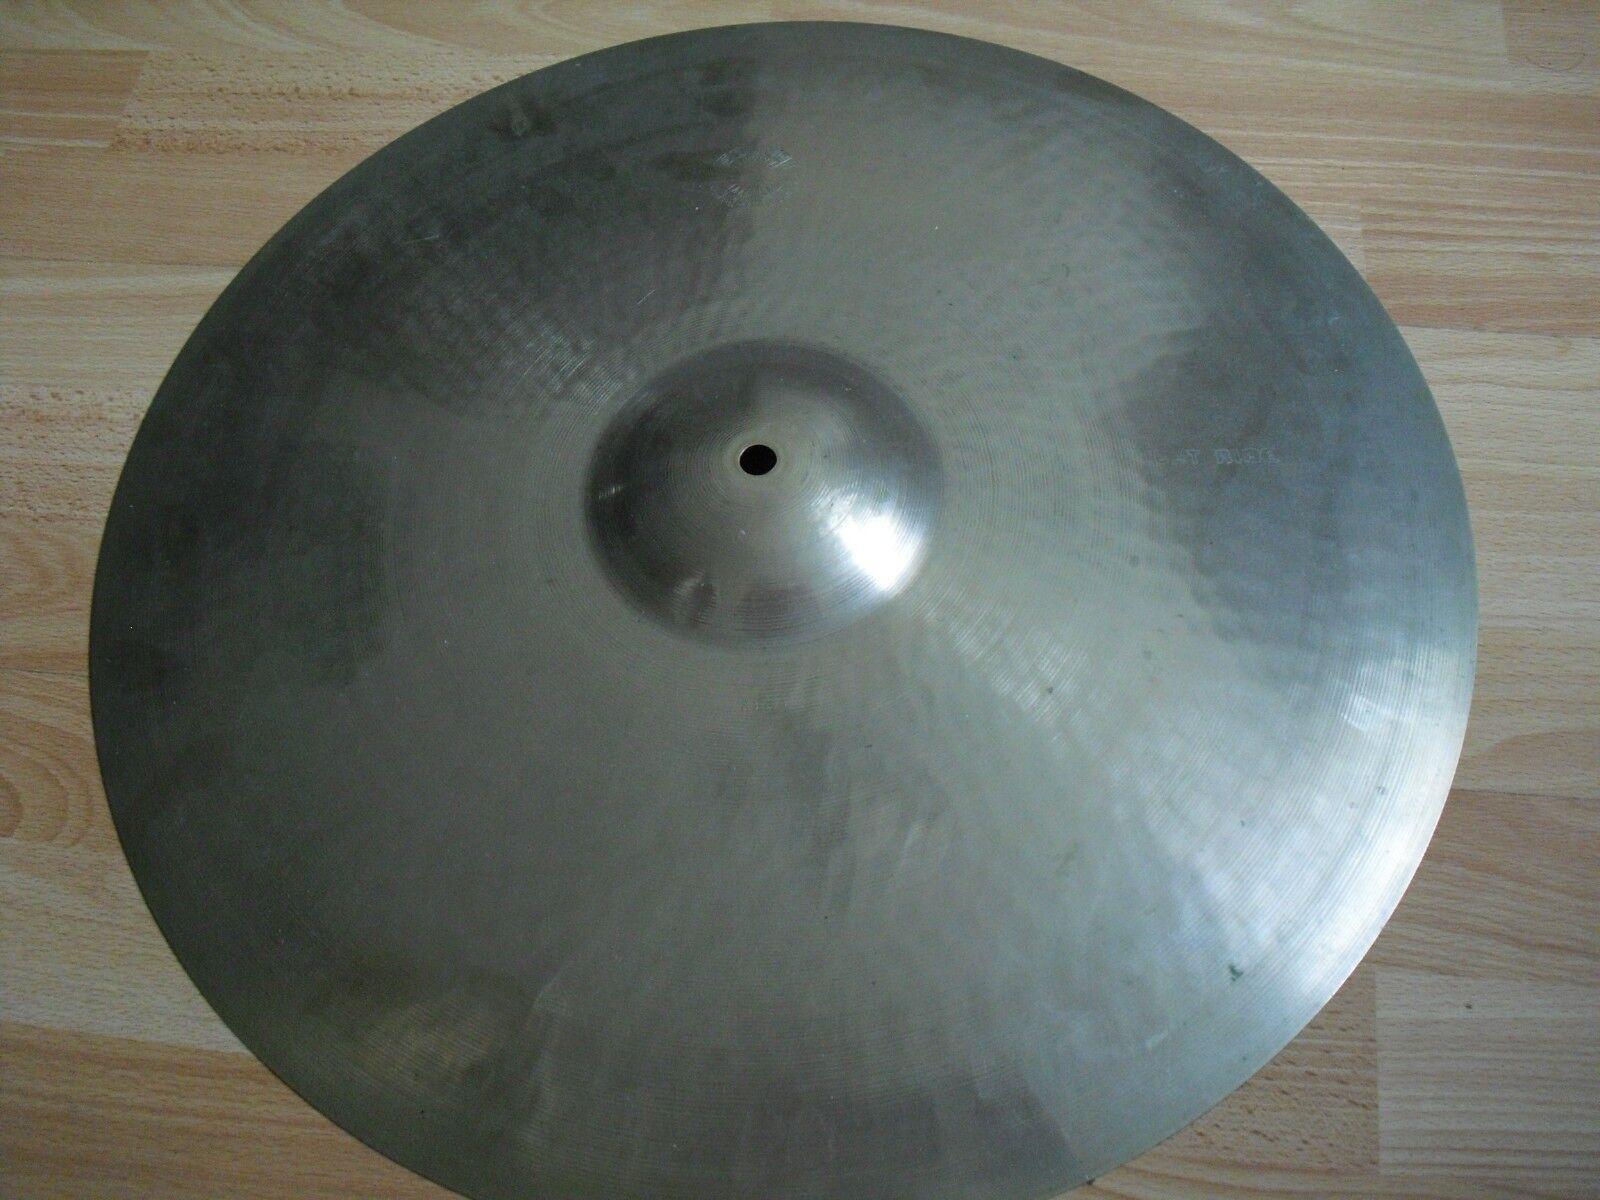 20  Vintage 70s Paiste Sound Creation Bright Ride Cymbal 1978 formula 602 alloy